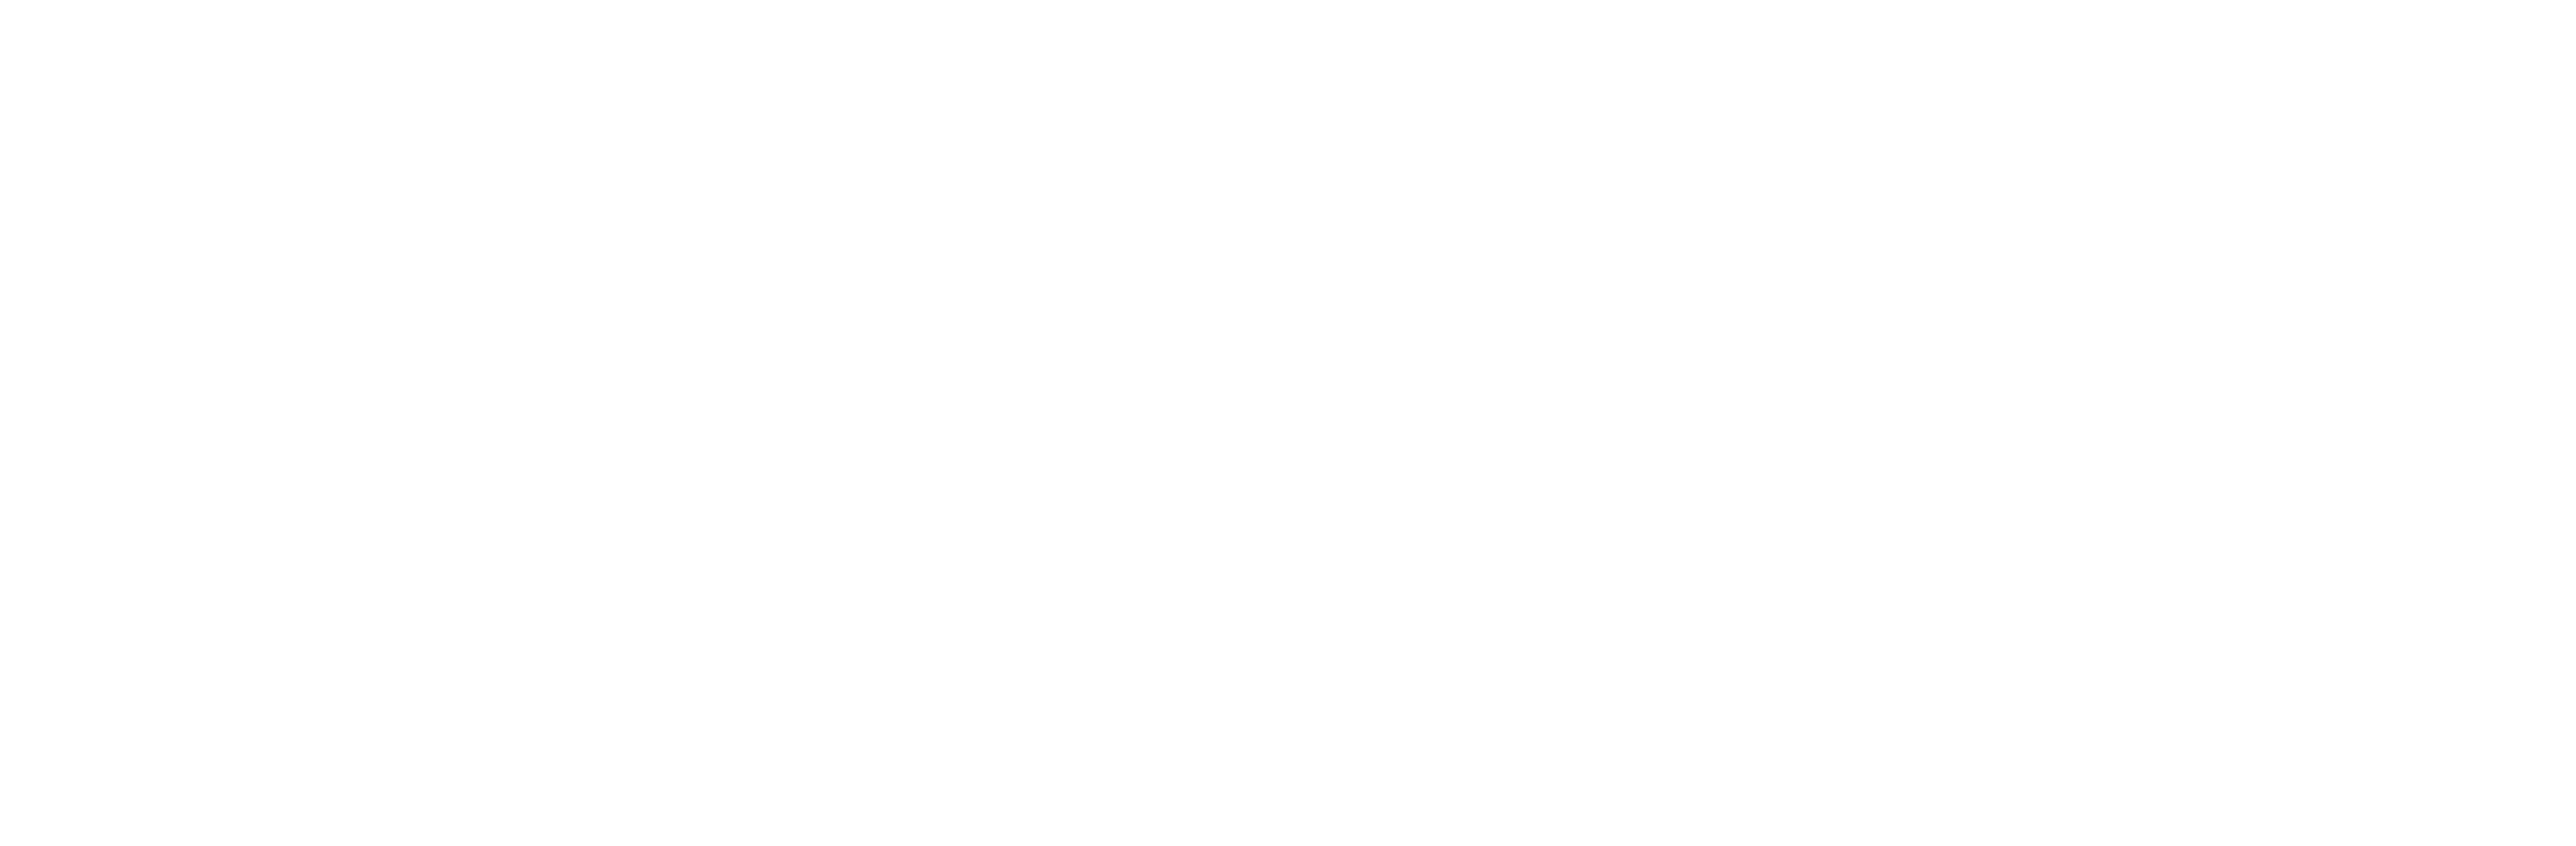 C3 On Demand